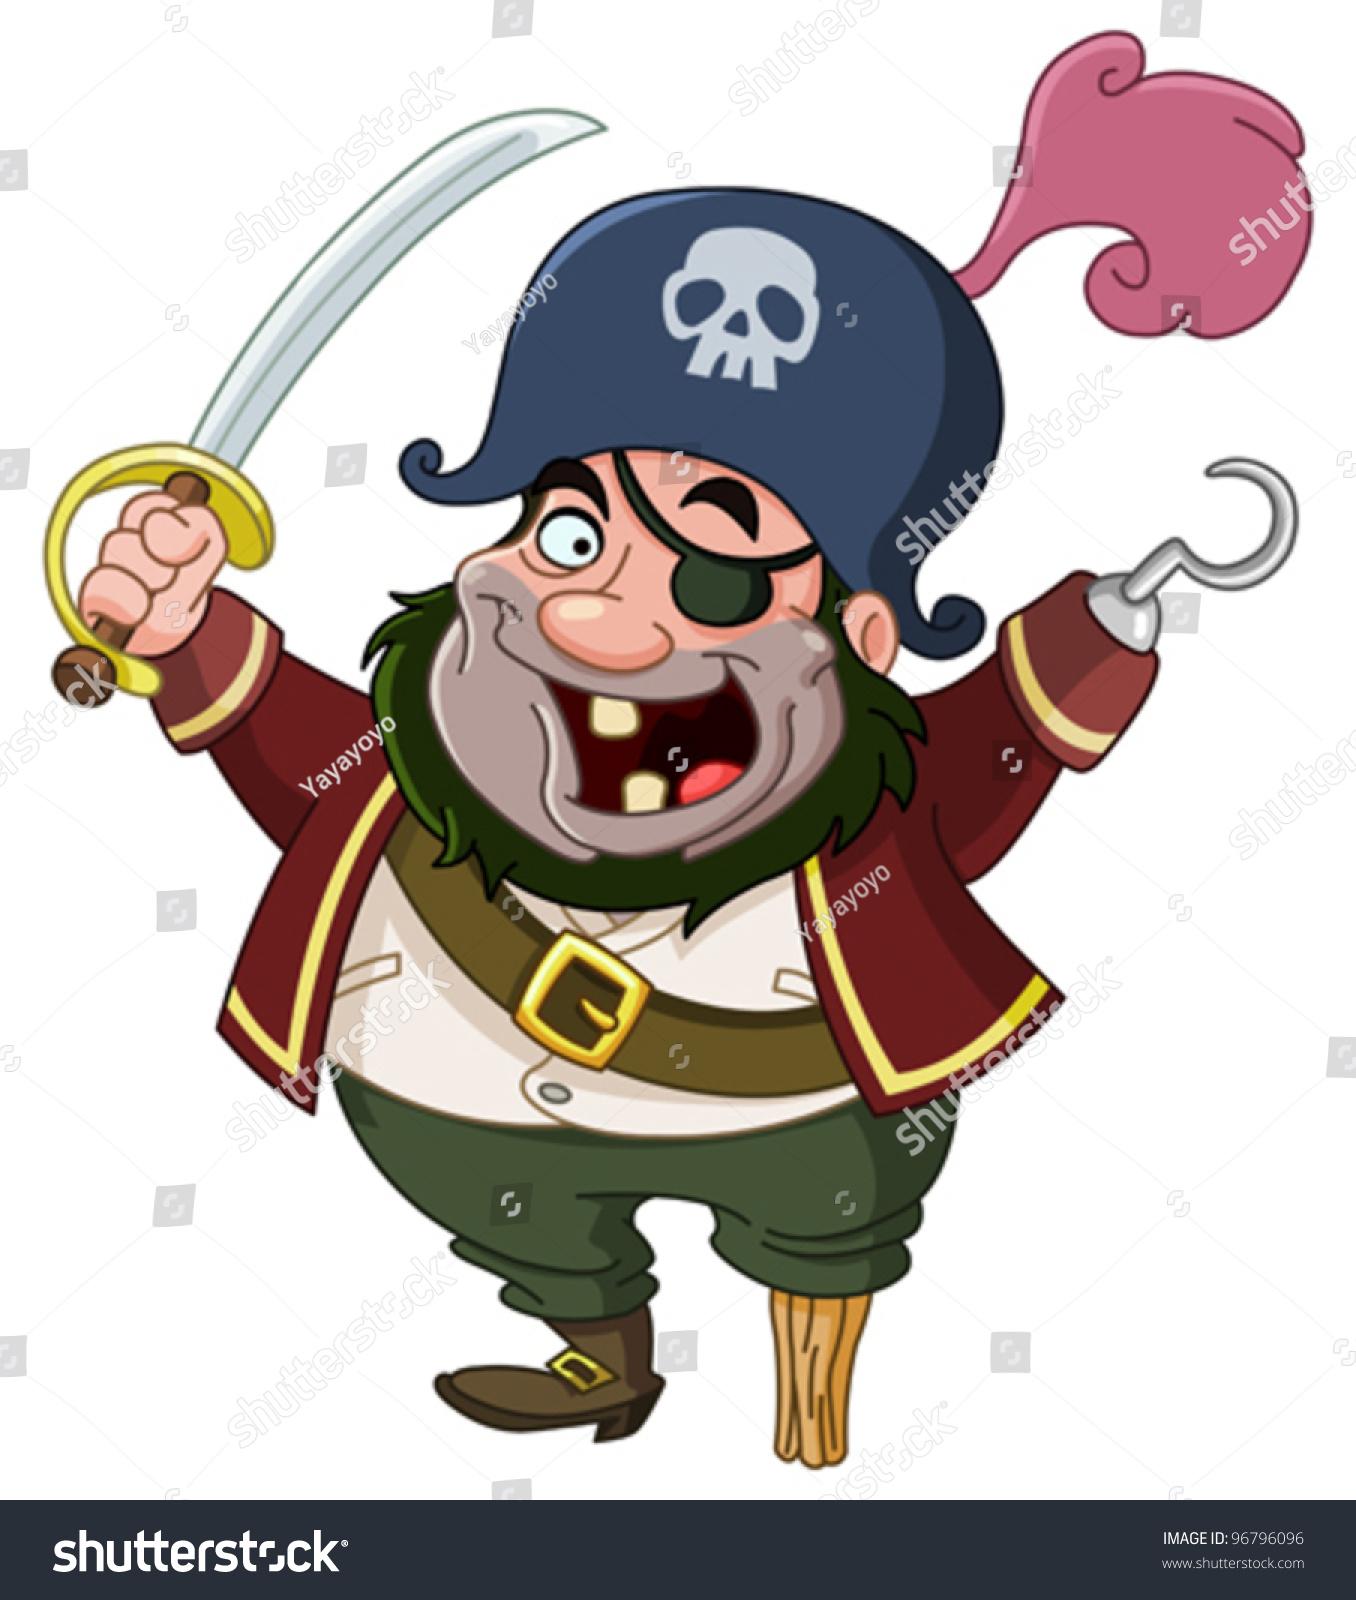 Cartoon Pirate Stock Vector 96796096 - Shutterstock